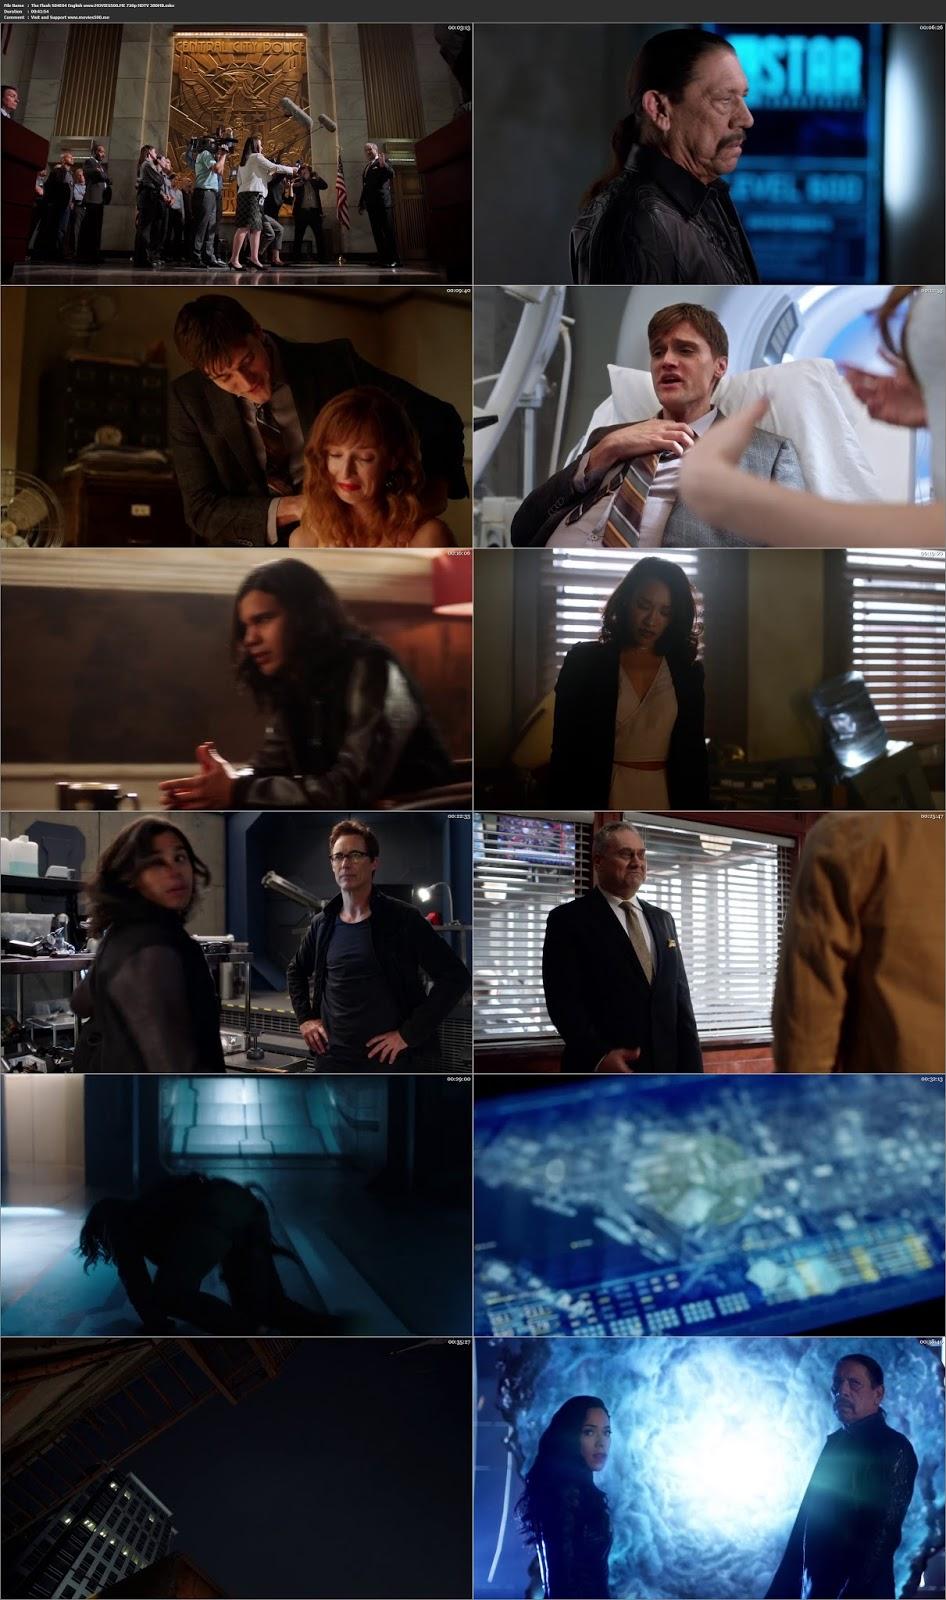 The Flash S04E04 English 325MB HDTVRip 720 at scientologymag.com